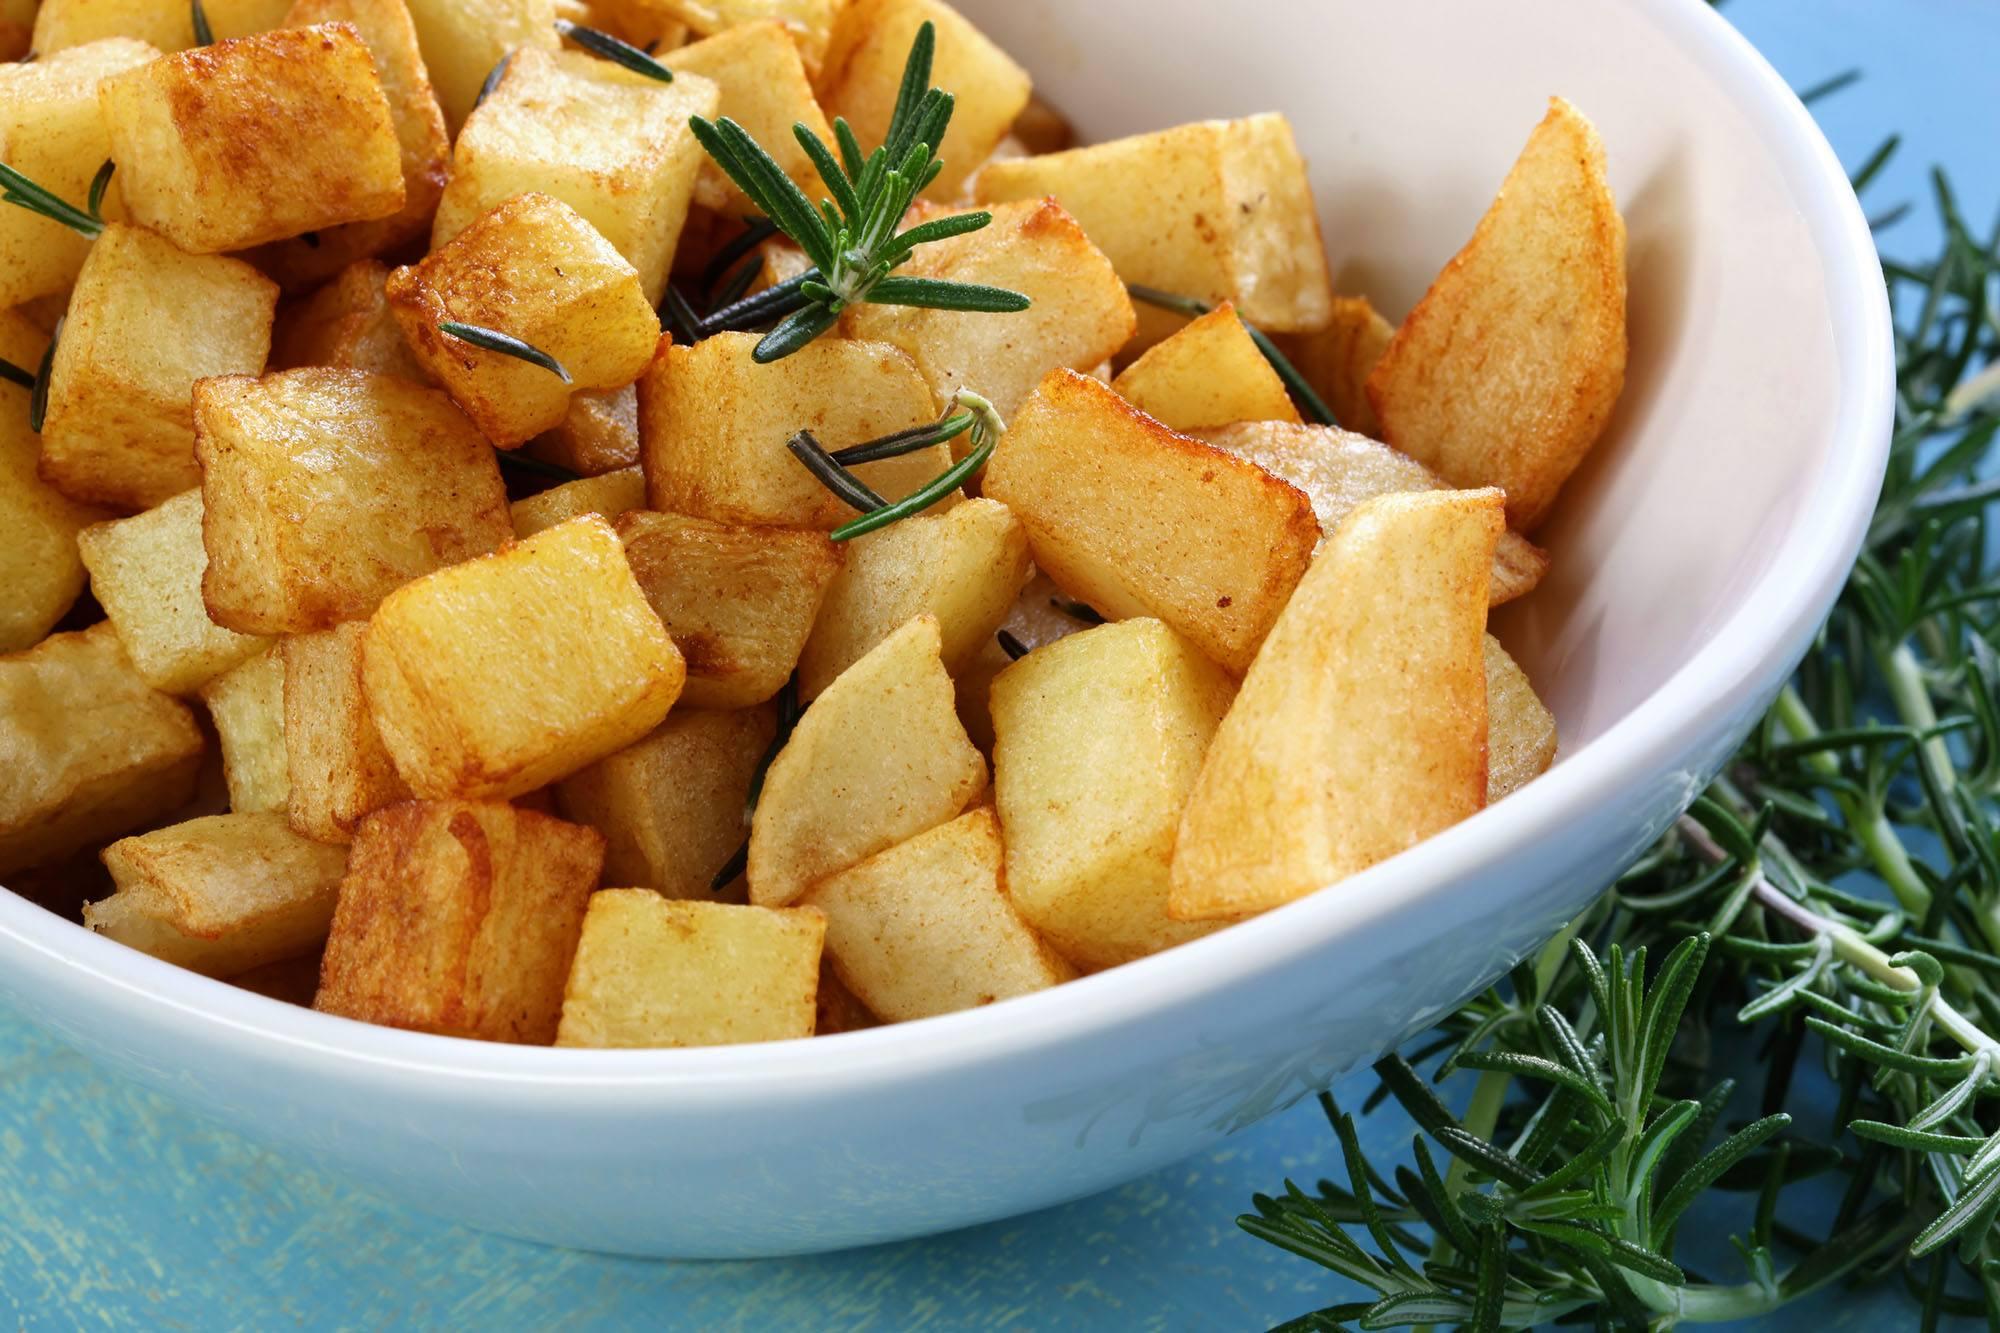 Potato cubes hash browns (Robyn Mackenzie/Shutterstock)